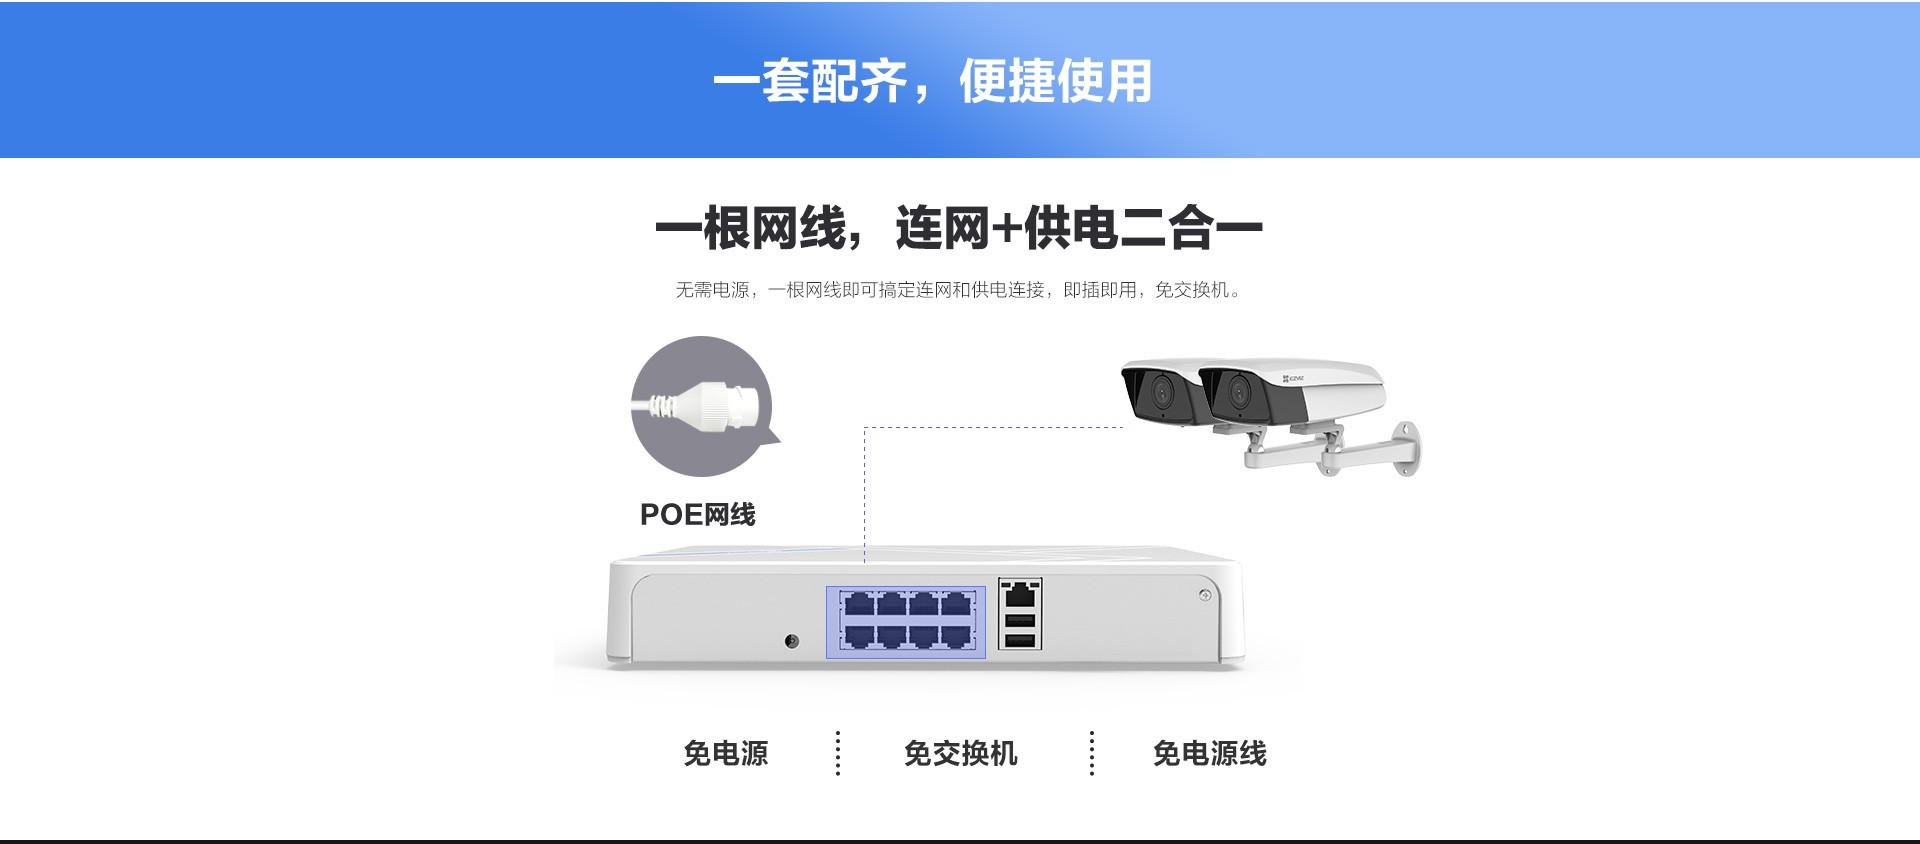 C5HC+X5SC套装-web_04.jpg